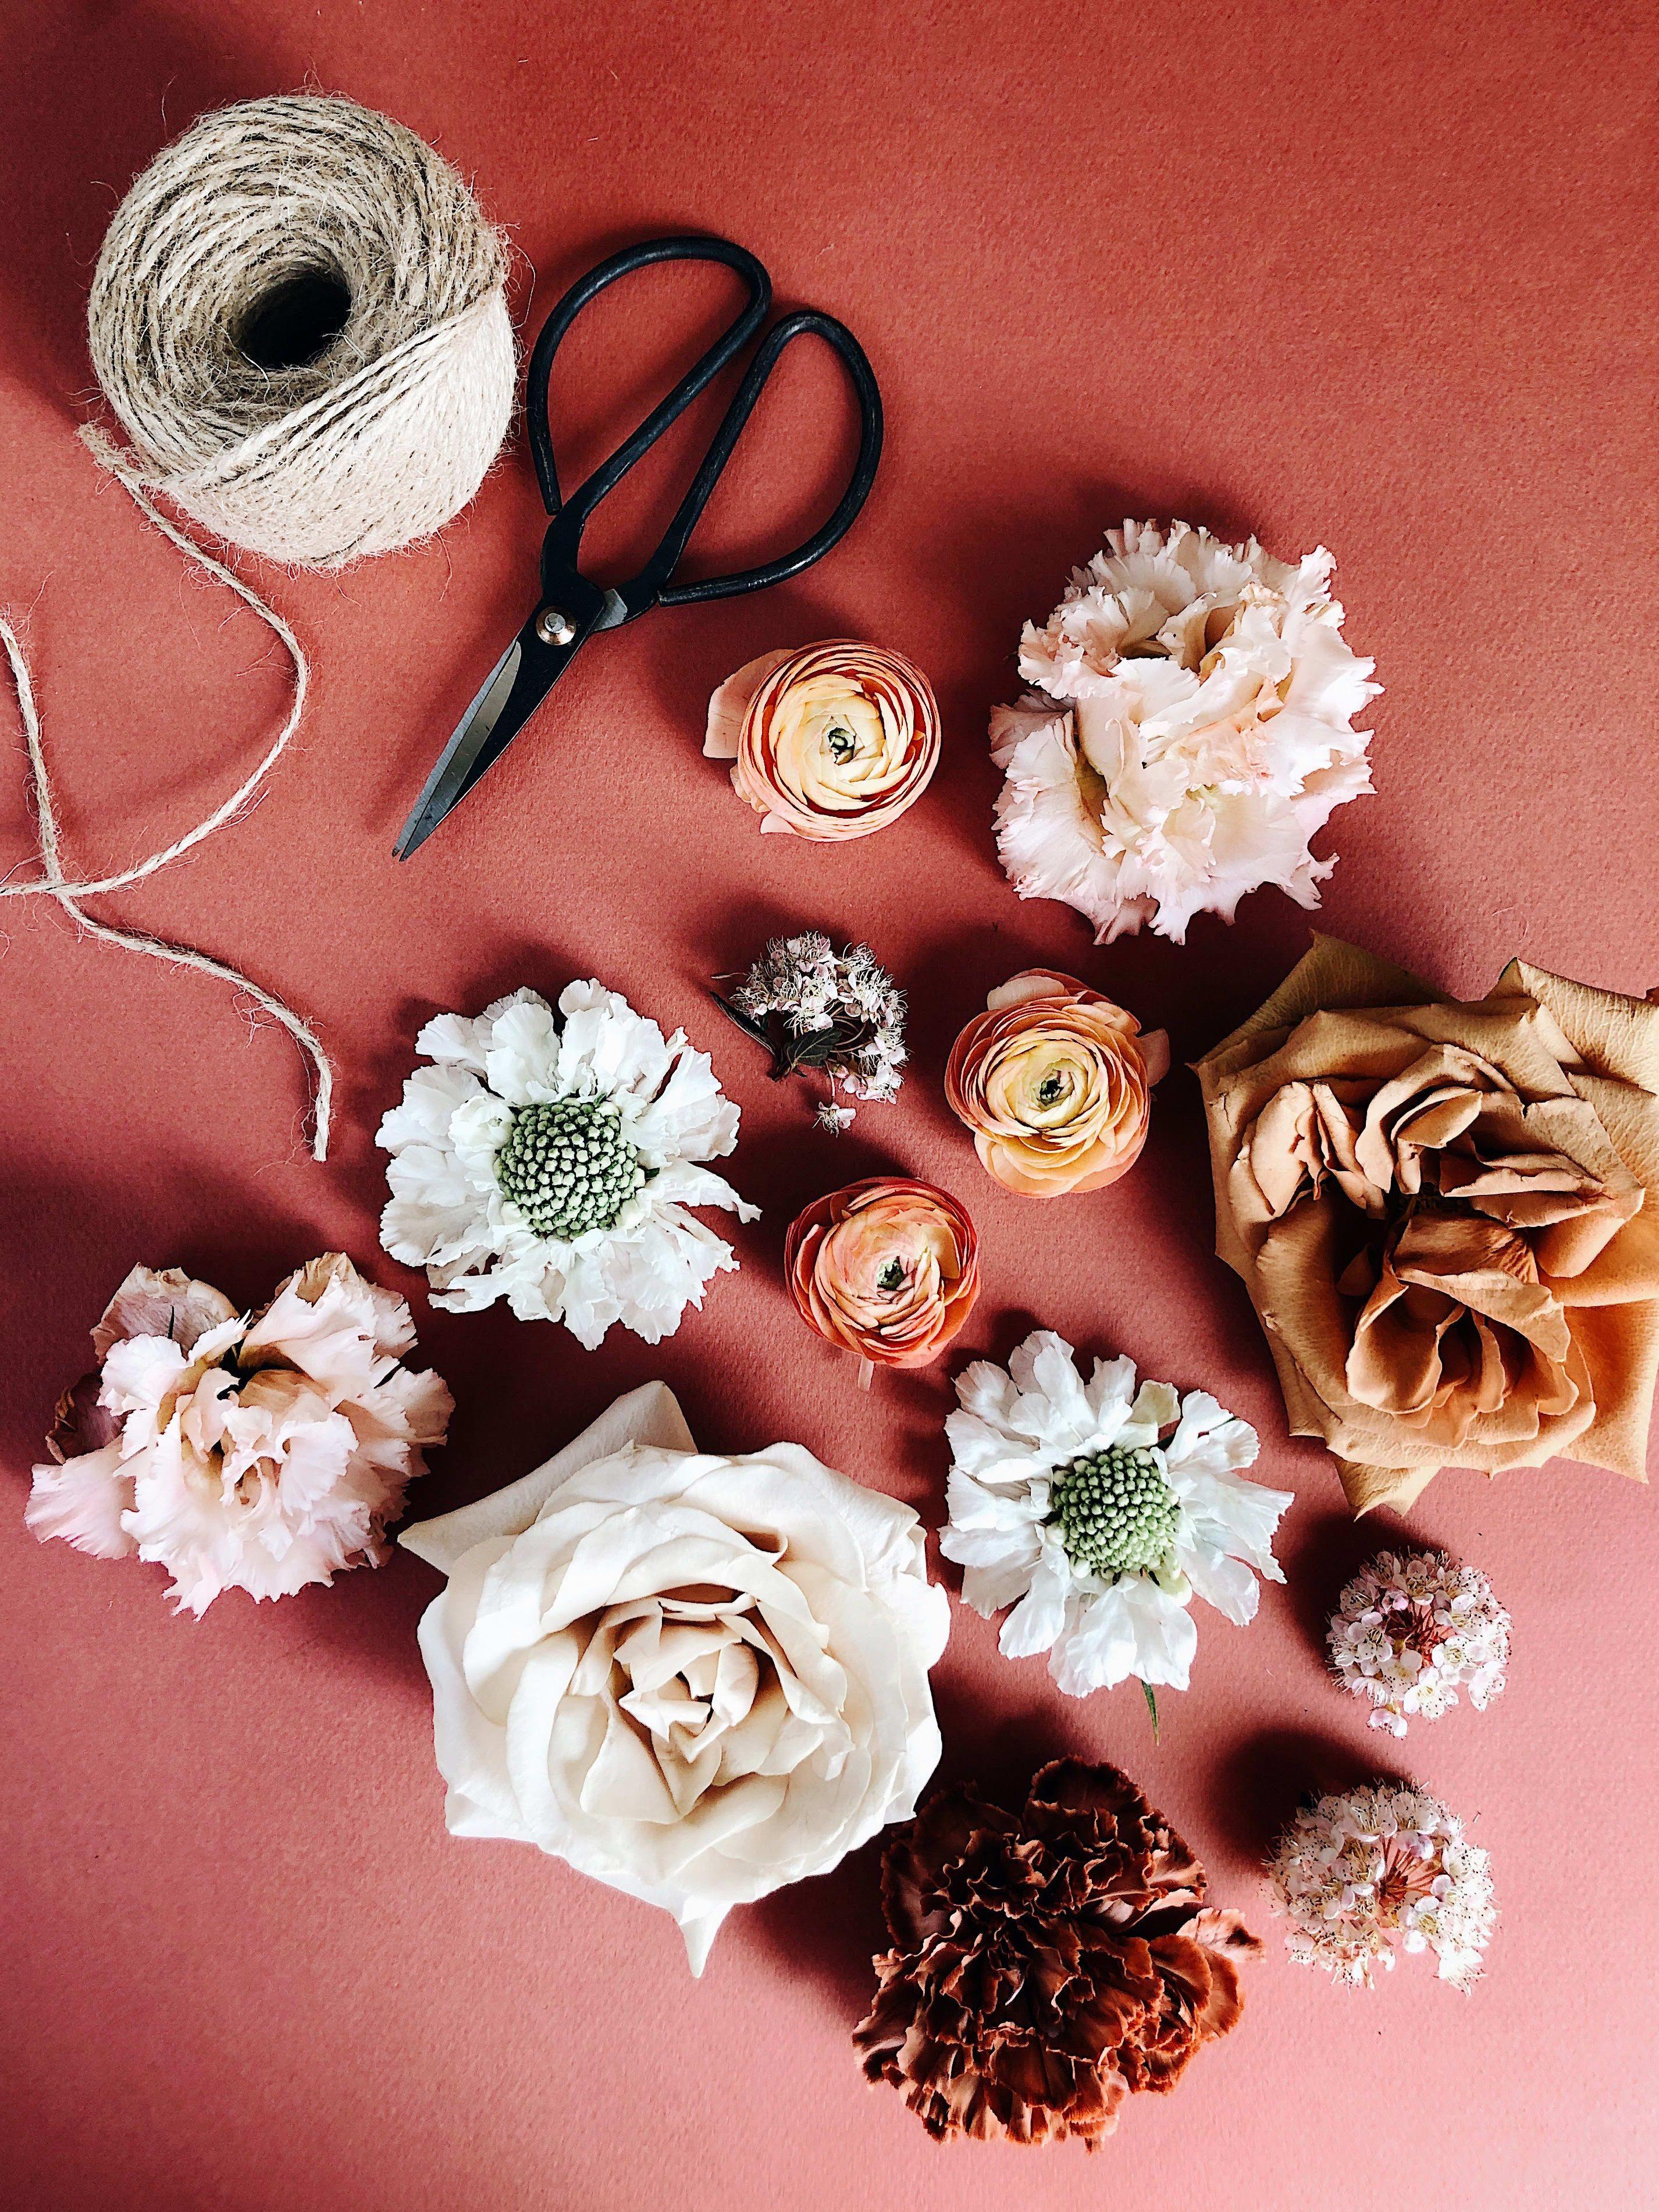 Easy diy flower bouquets to make in 4 simple steps diy